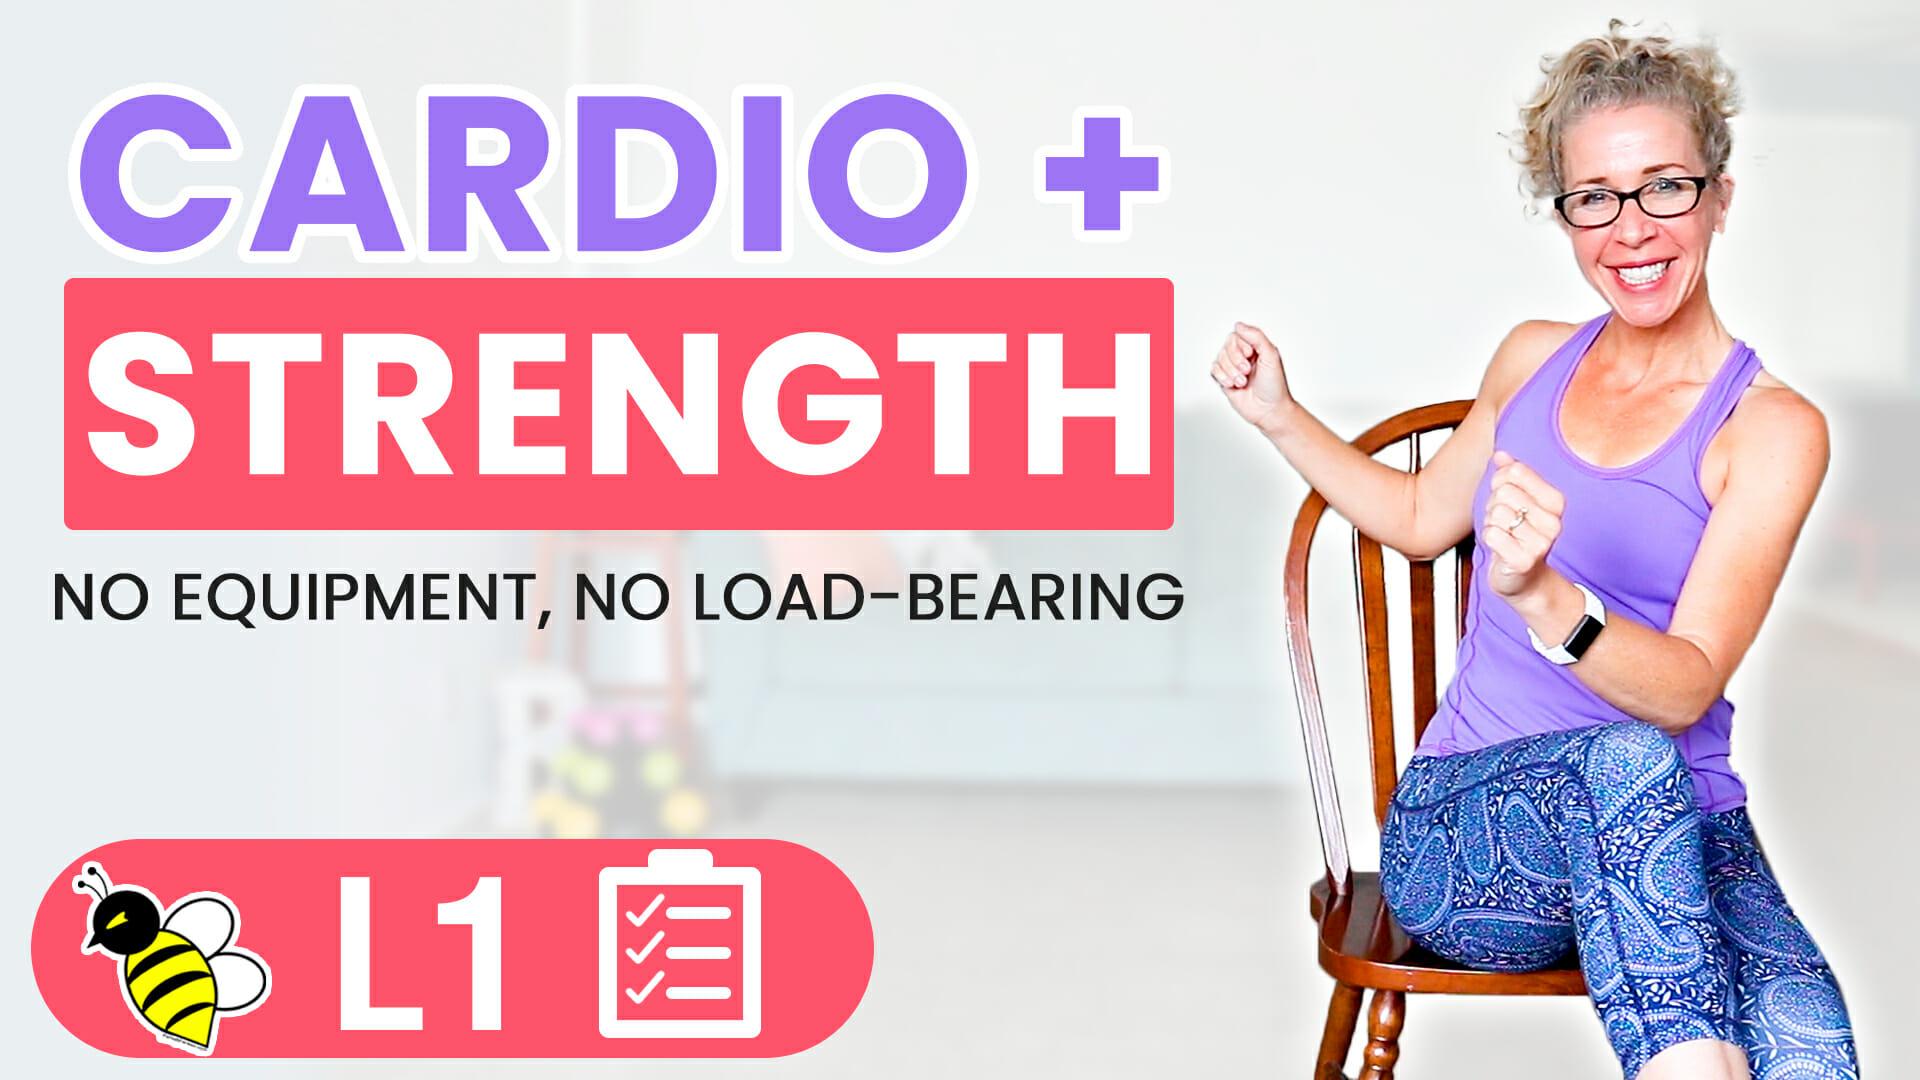 35 Minute SEATED Bodyweight Cardio + Strength BURN 250 Calories